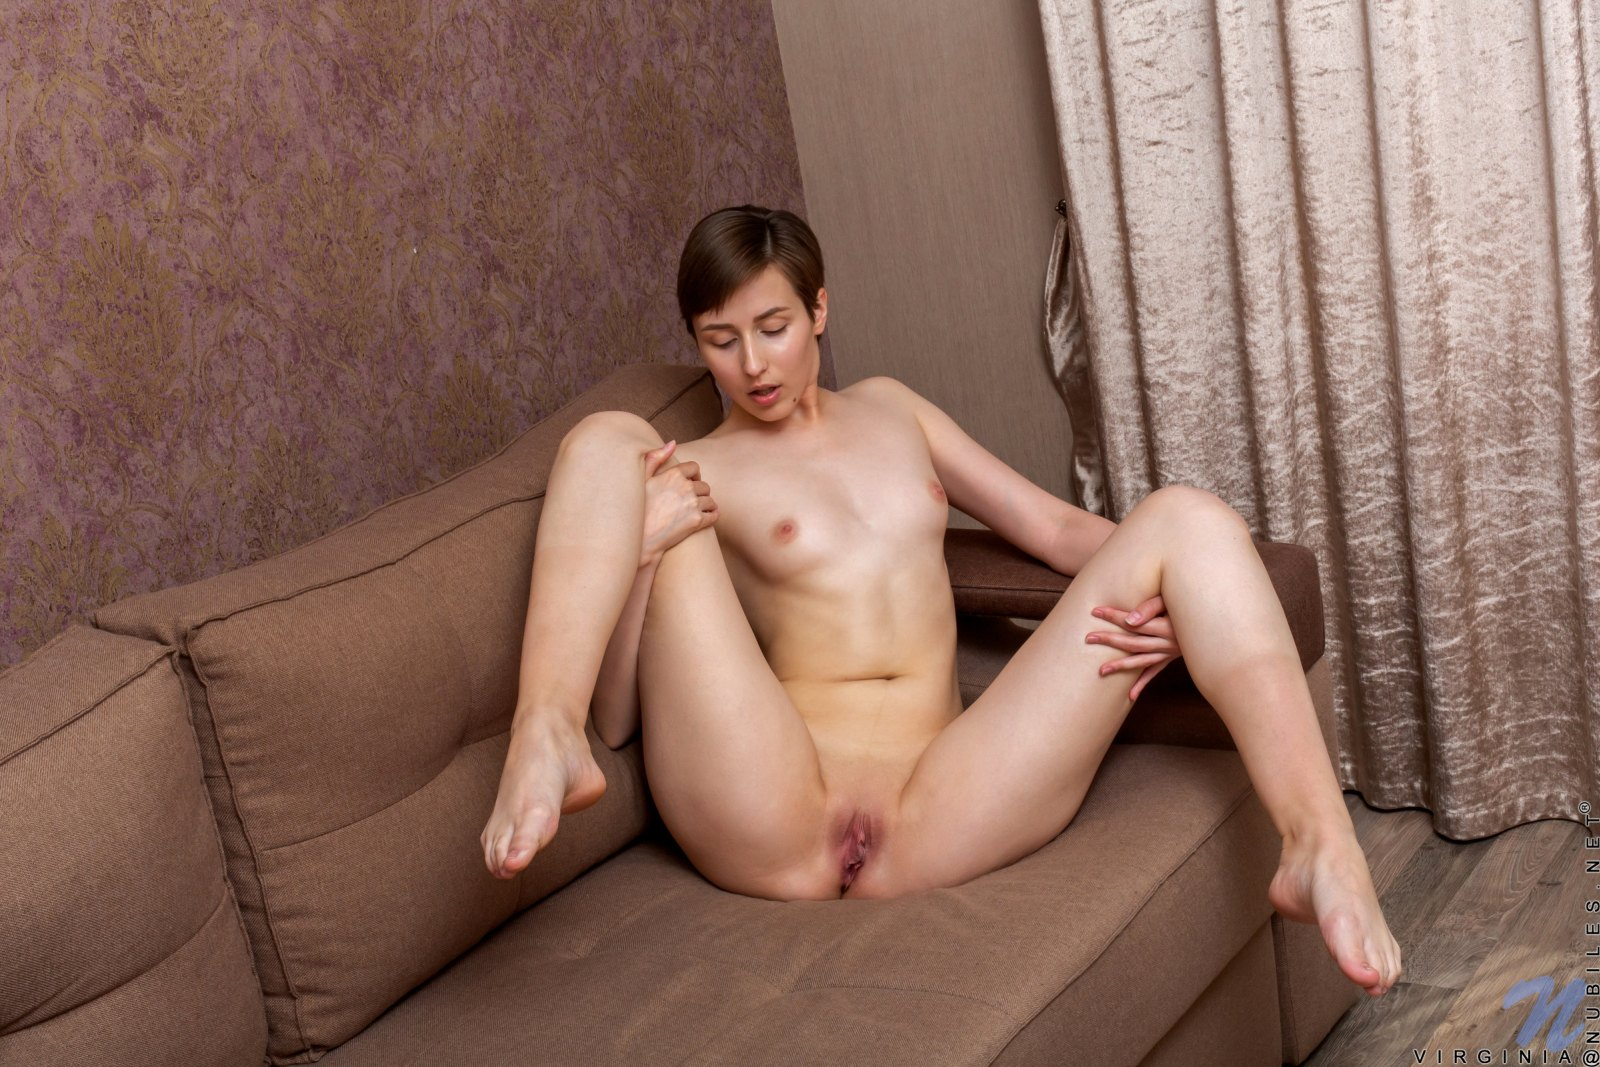 Virgin girls sexy pics